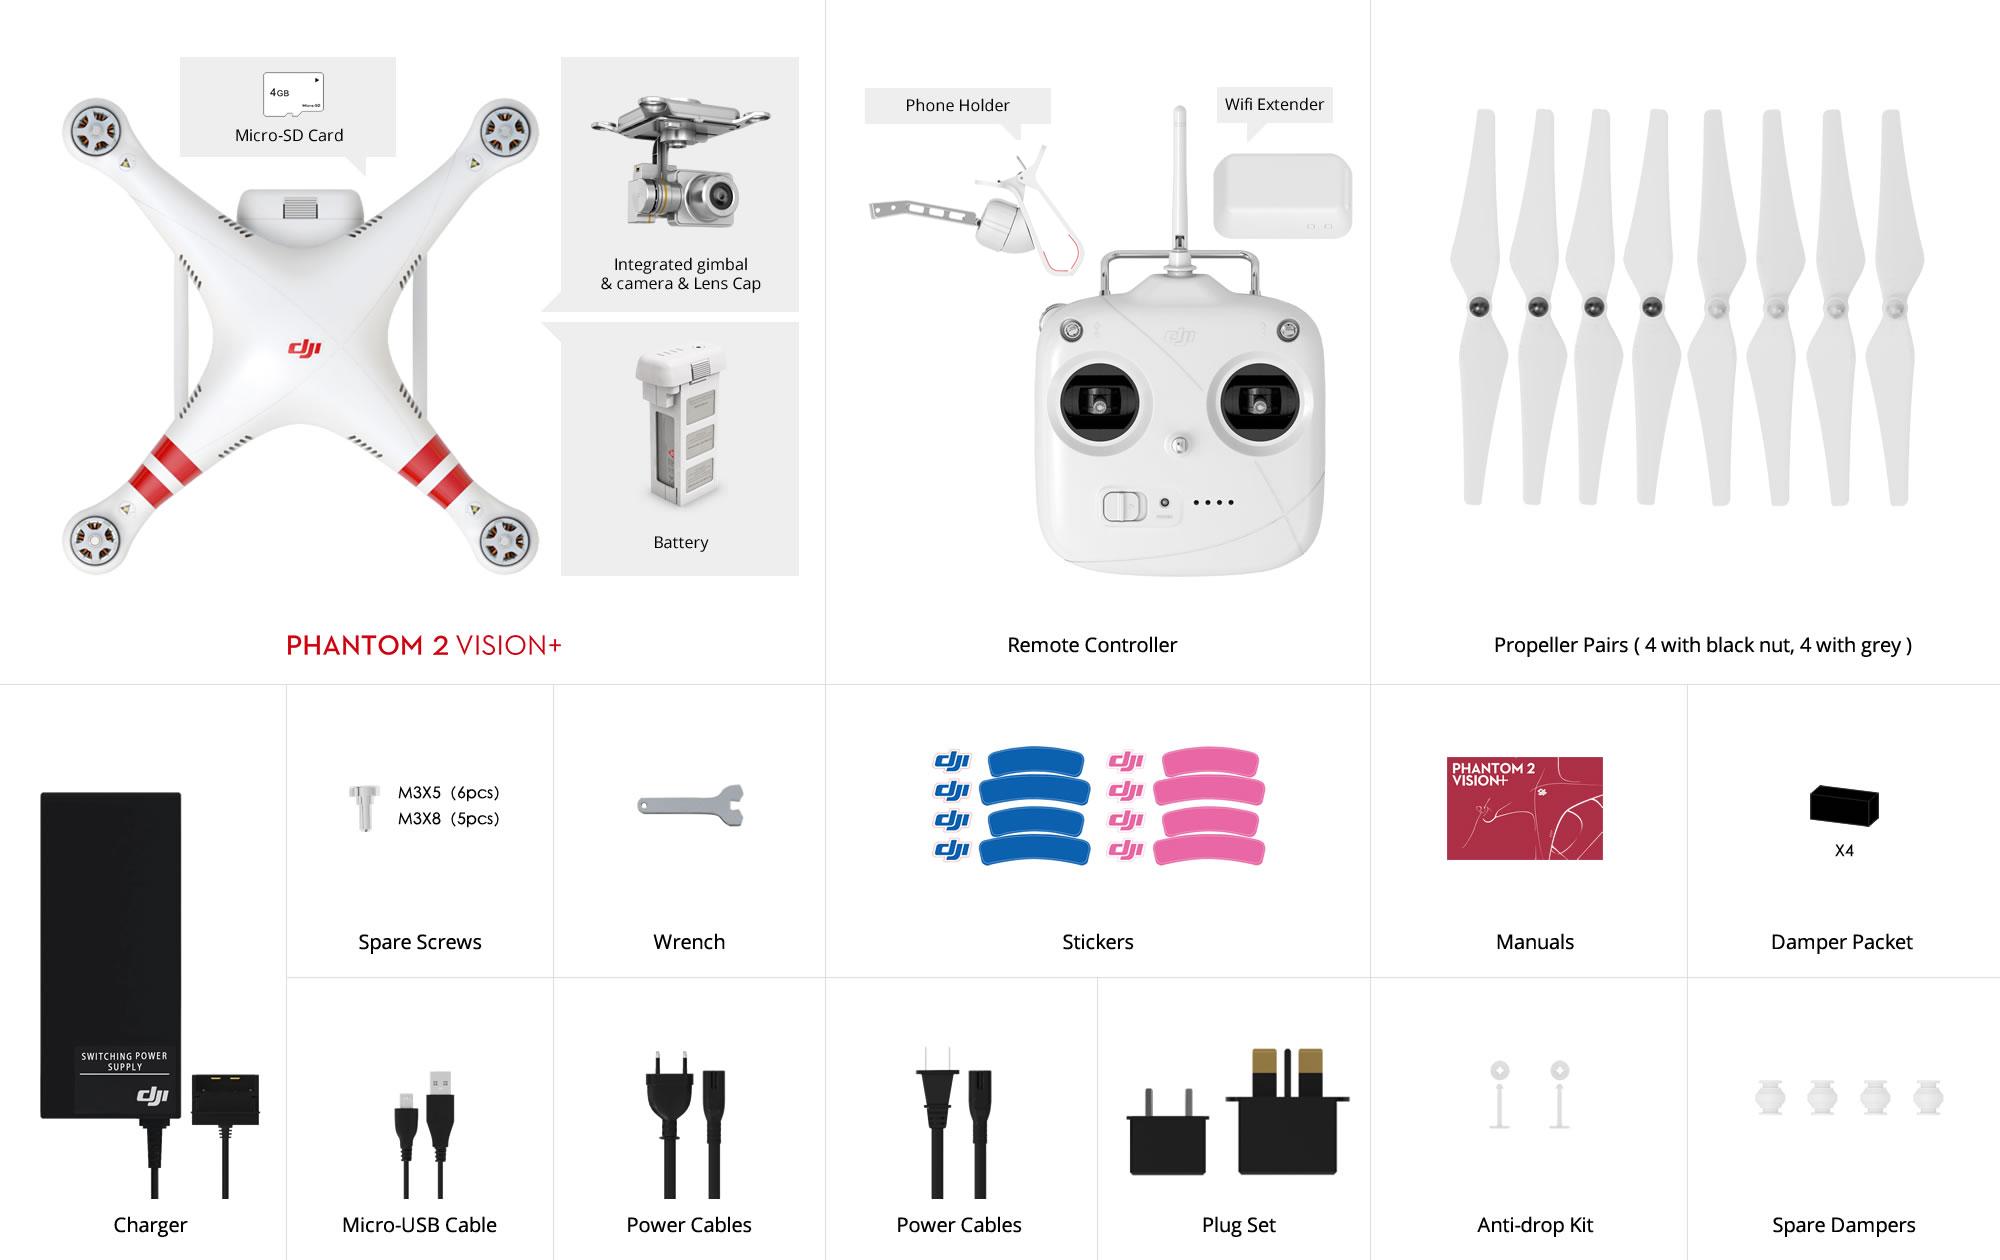 f7ff07472182f024c30d3e65b1dc8bd8 dji phantom vision plus quadcopters co uk phantom 2 vision plus camera wiring diagram at eliteediting.co